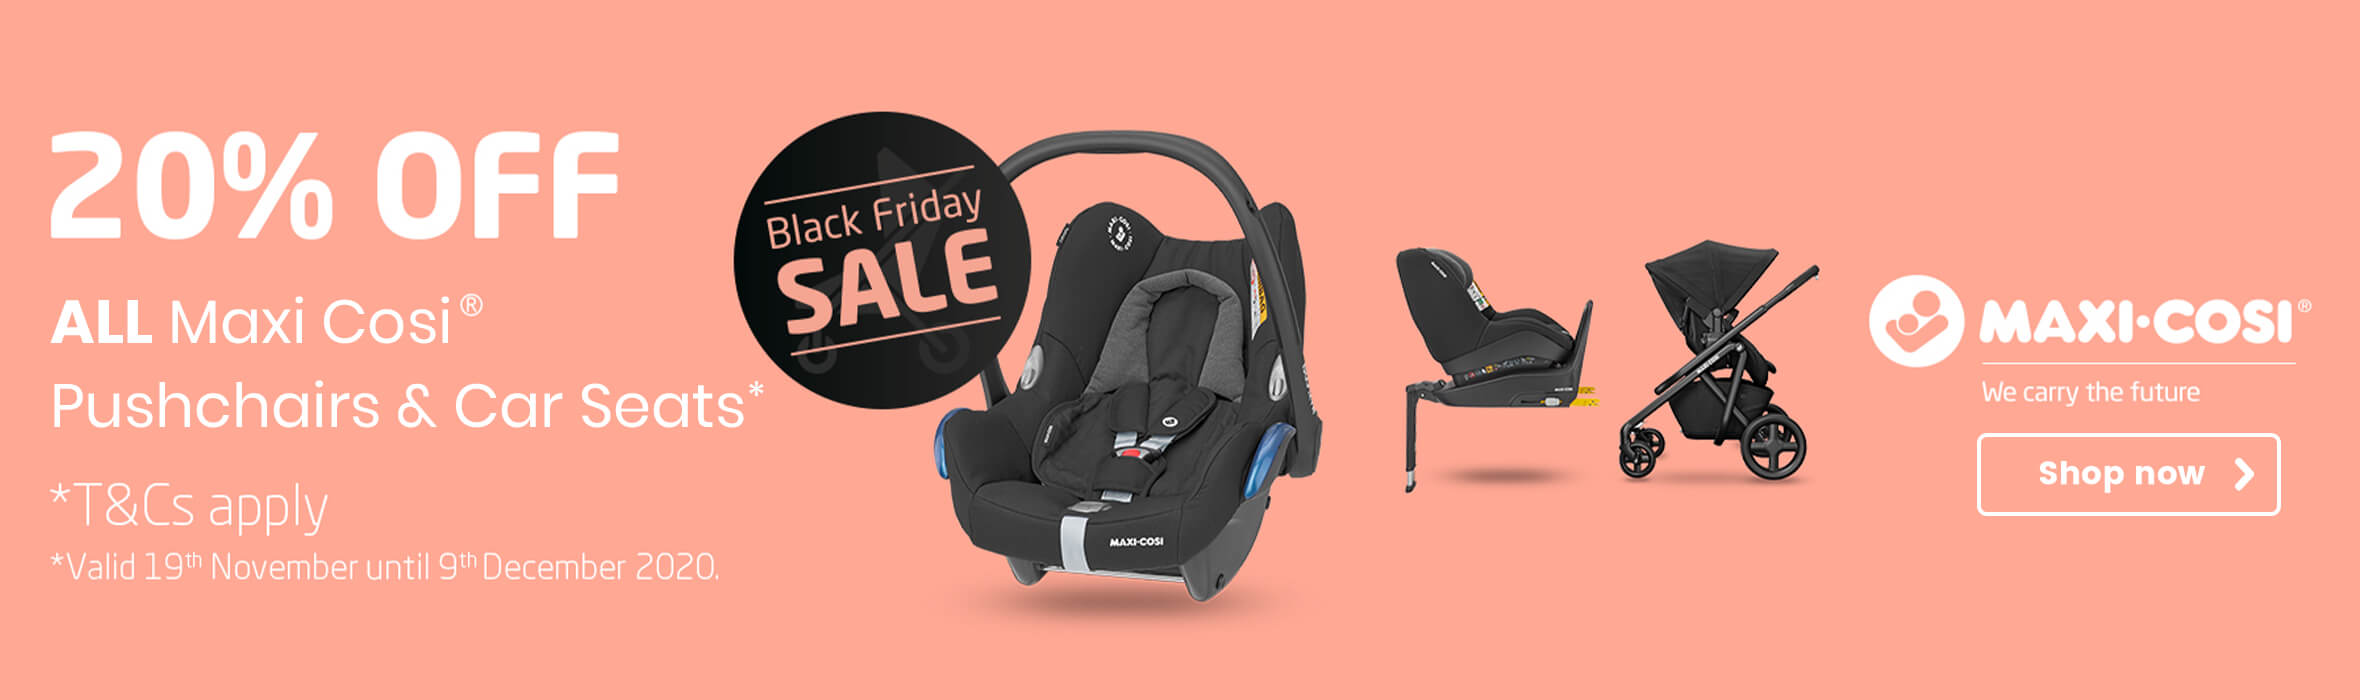 20% off Maxi Cosi Pushchairs & Car Seats